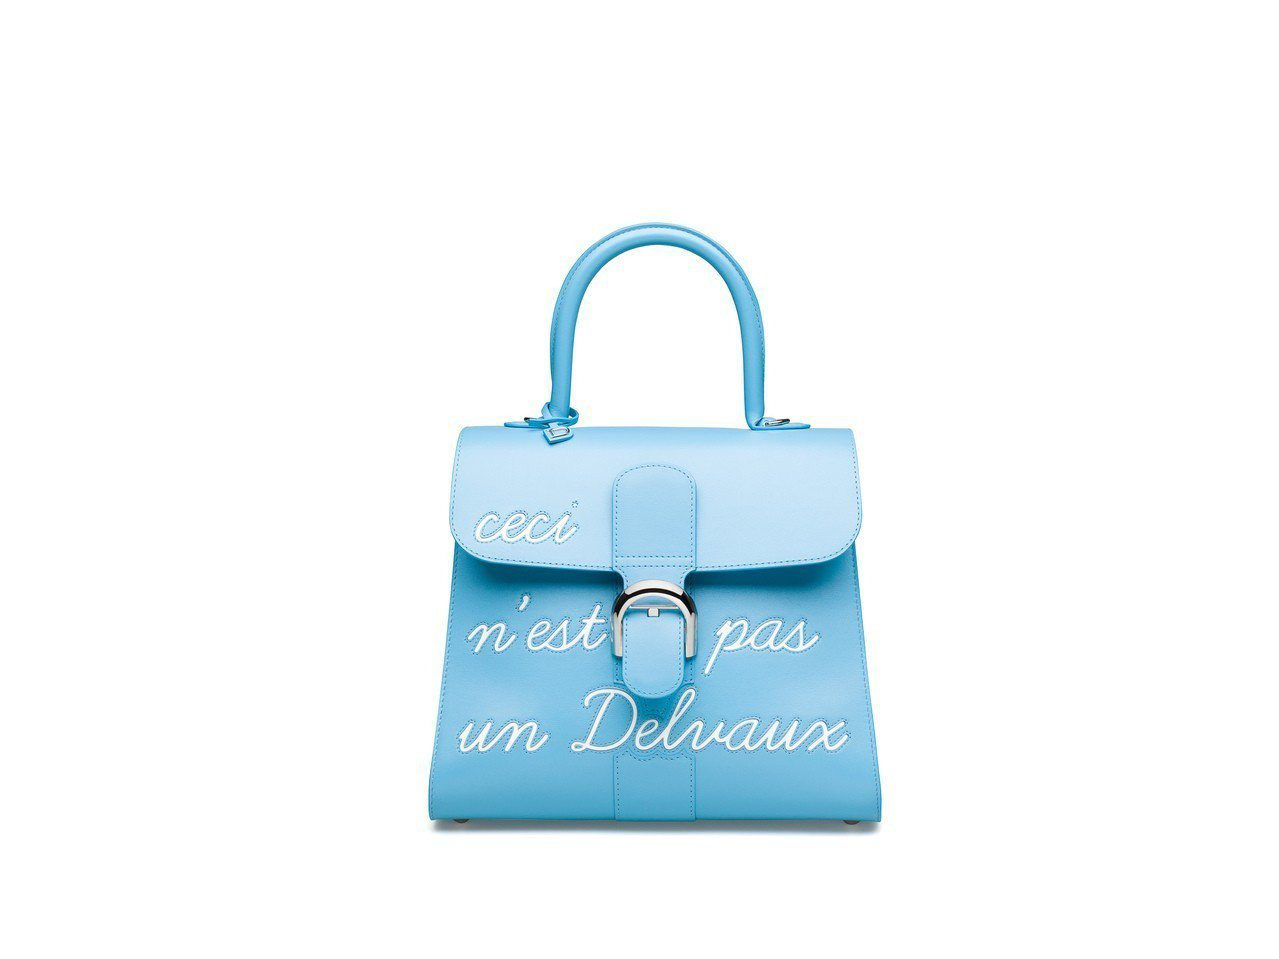 Magritte天堂藍L Humour中型牛皮肩背包,售價27萬7,300元。圖...